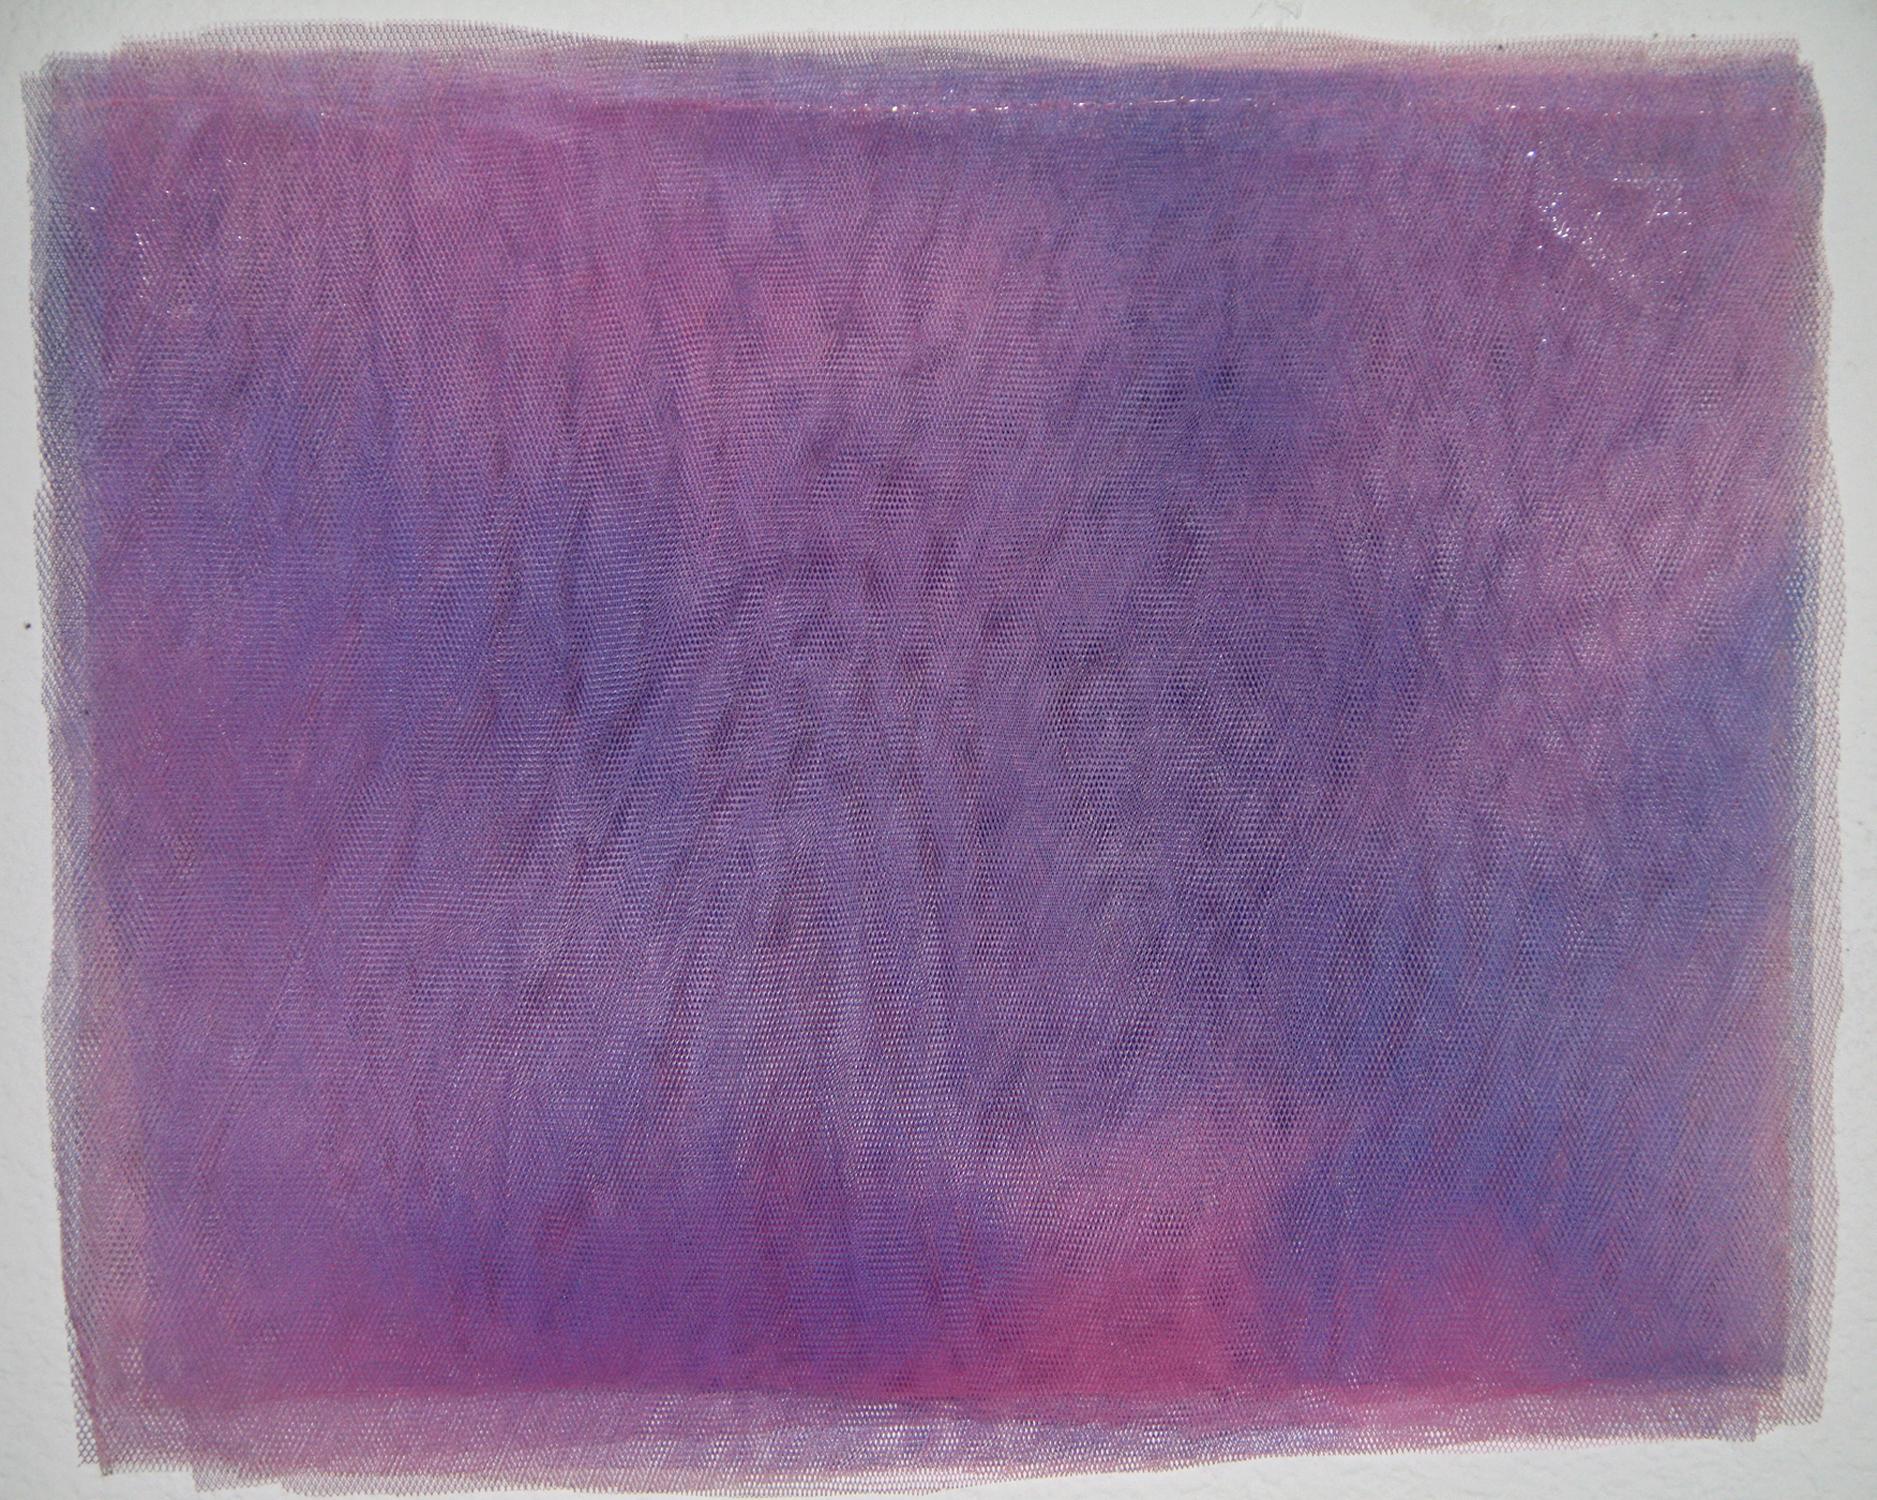 Breslaw,Purple Heaven,layered transparent mesh,paint, 10.25_x 13.75_,2014,$595.jpg